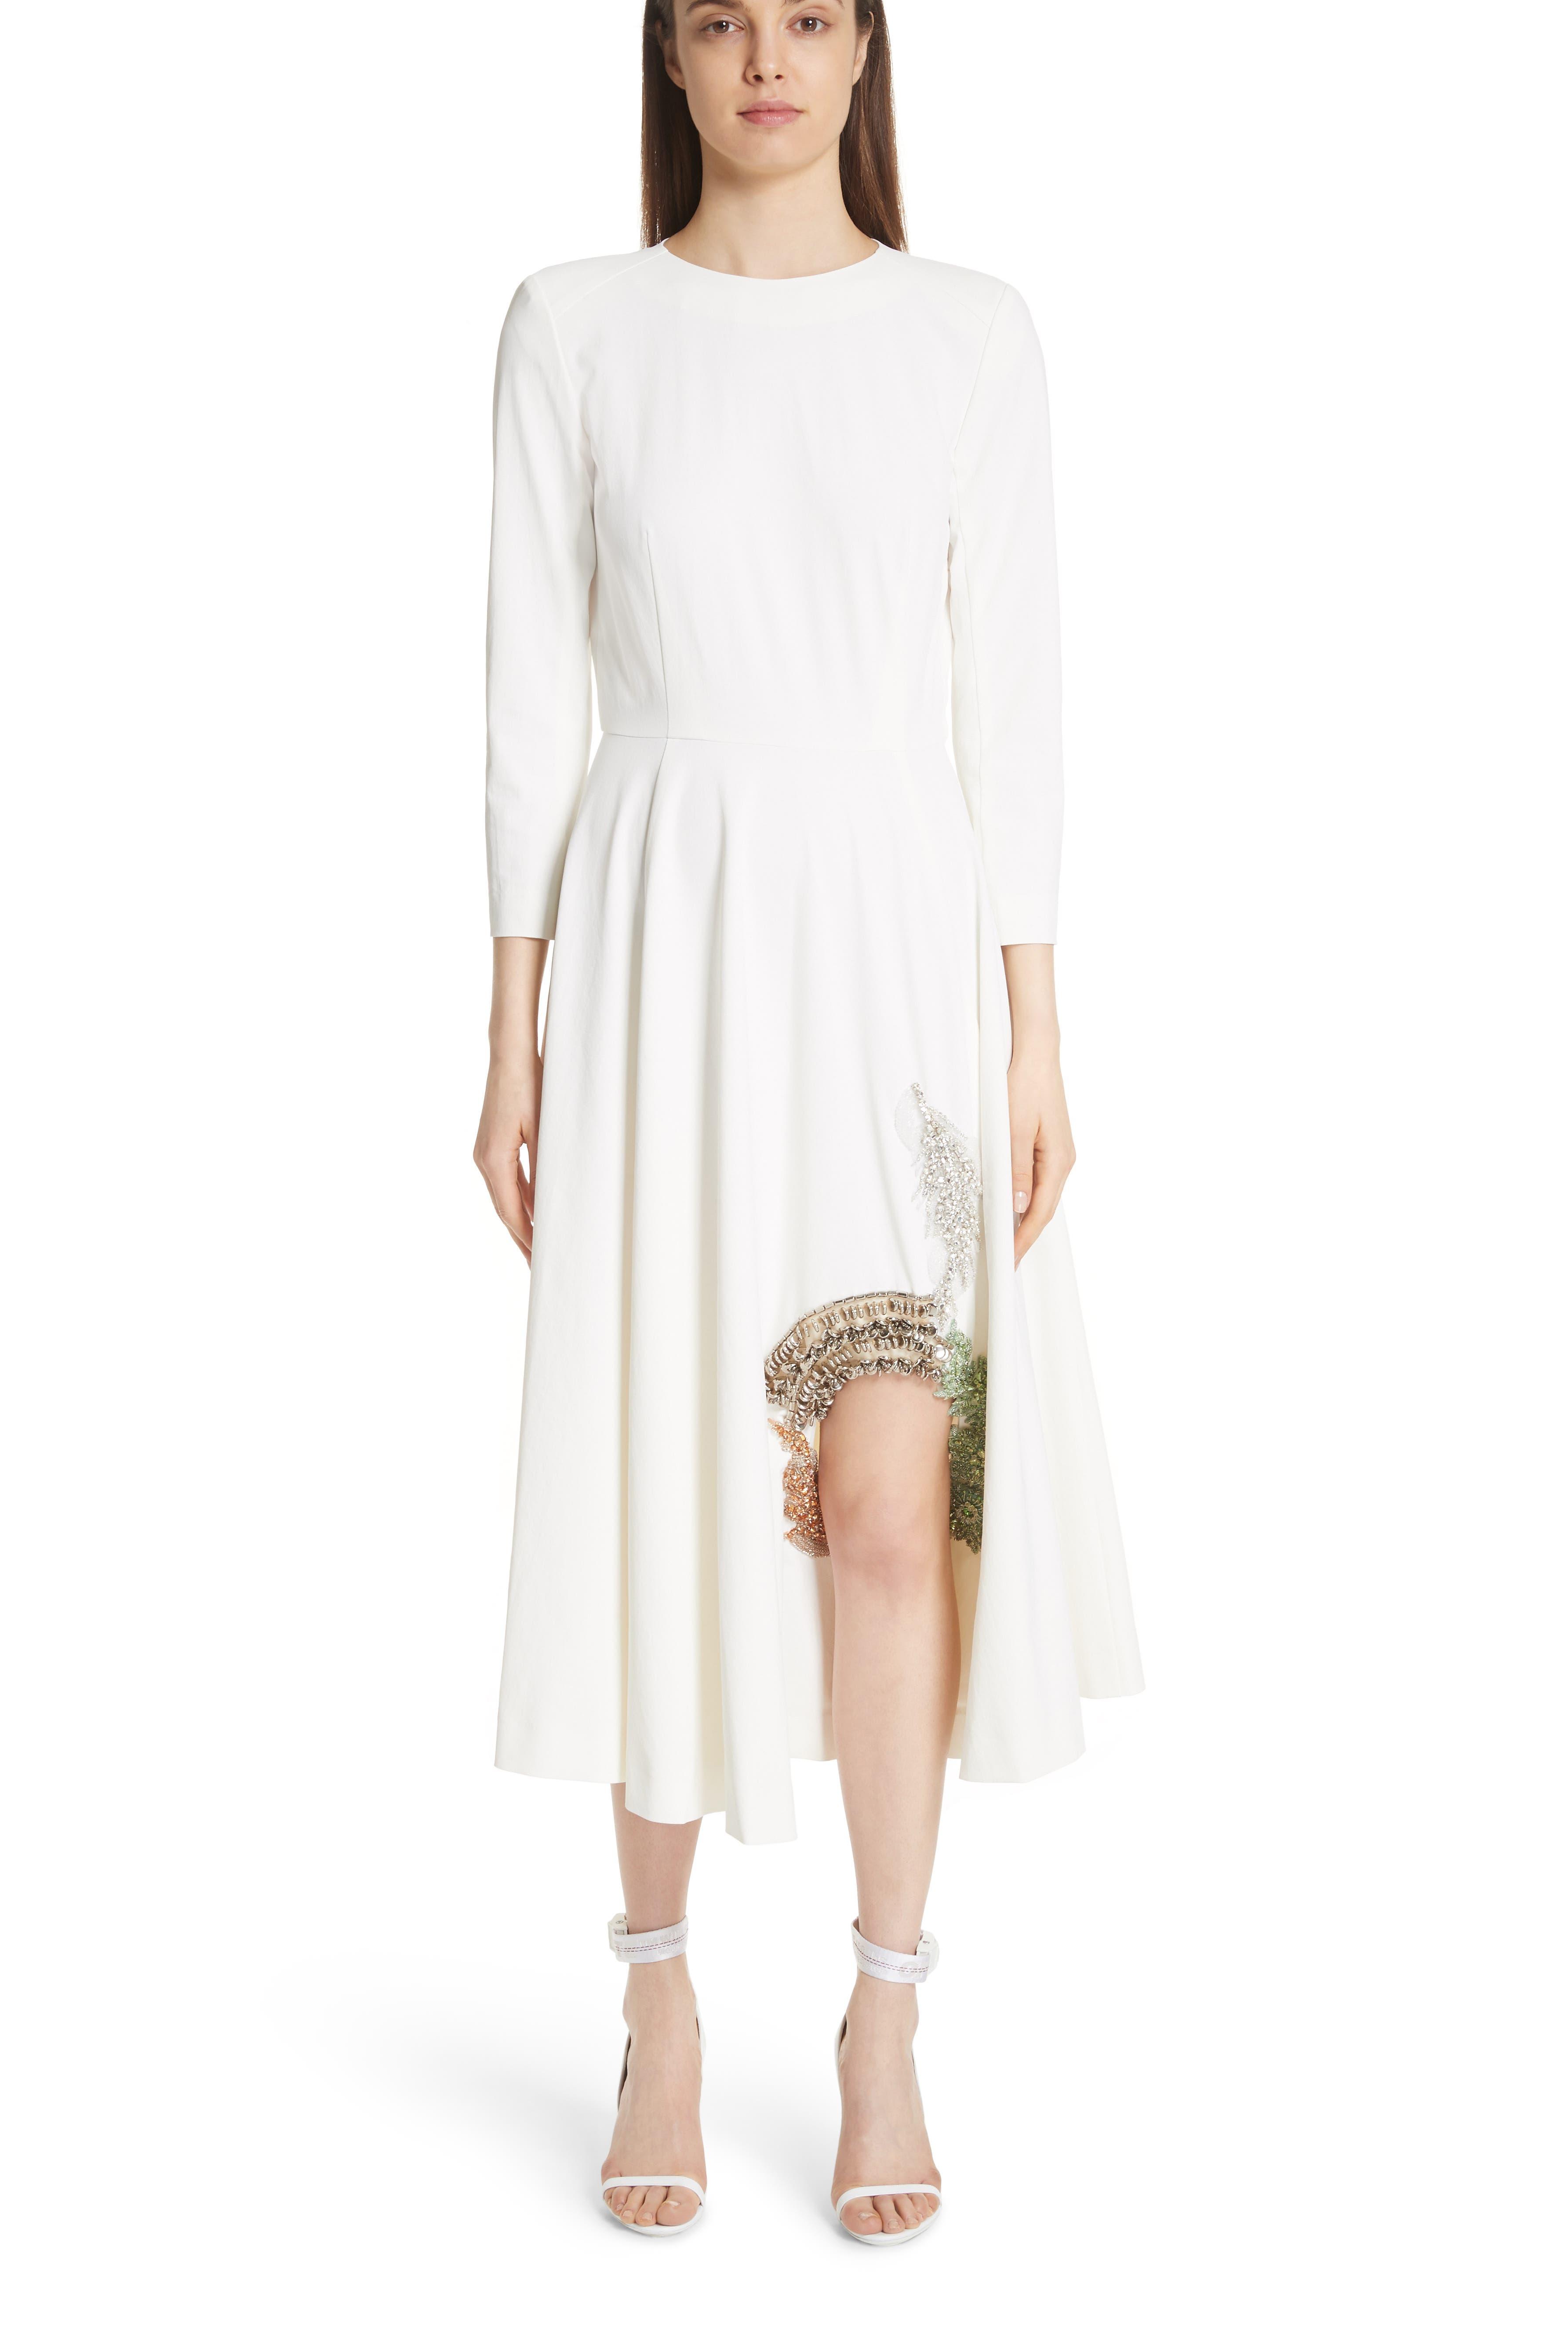 TOGA,                             Beaded Keyhole Dress,                             Alternate thumbnail 5, color,                             100